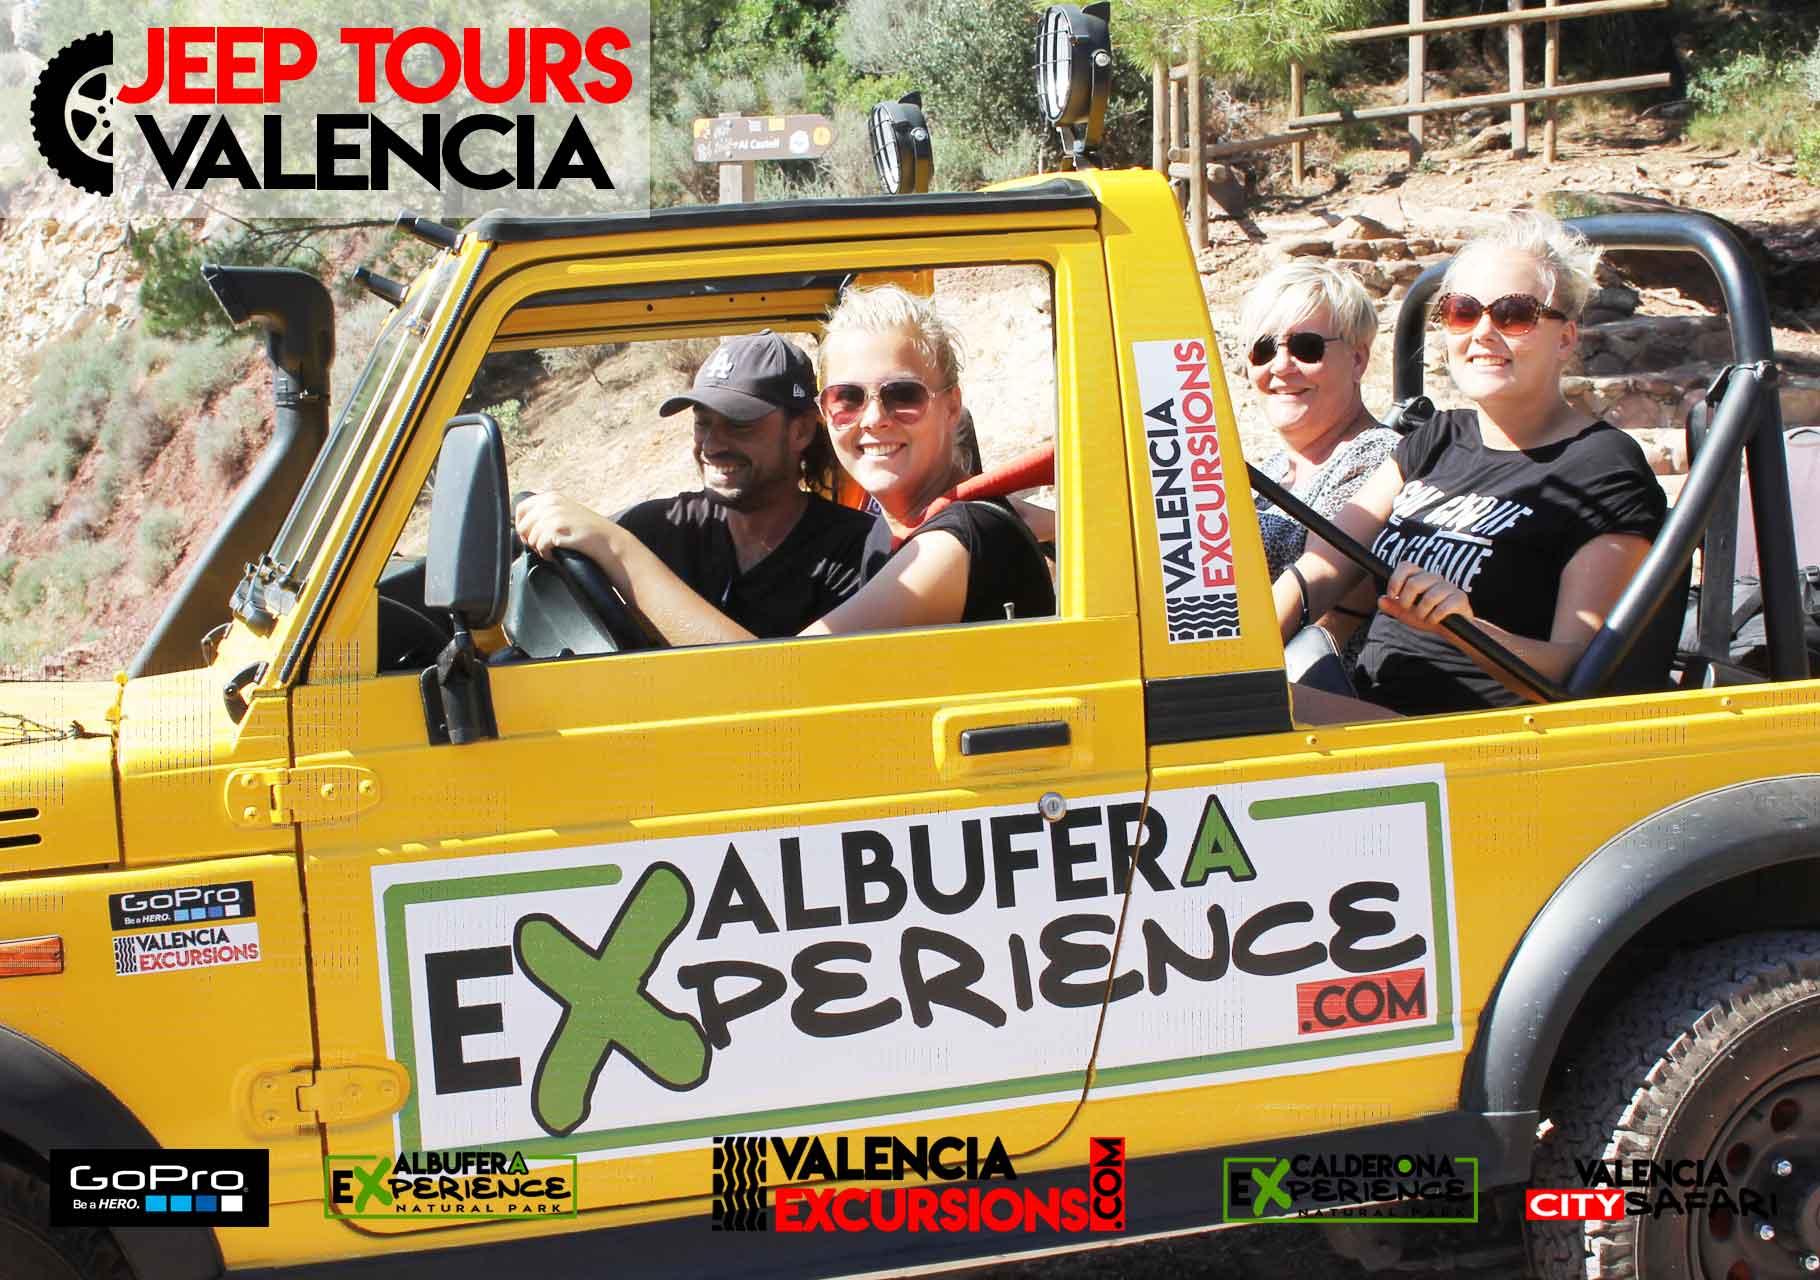 Albufera Jeep Tour Valencia